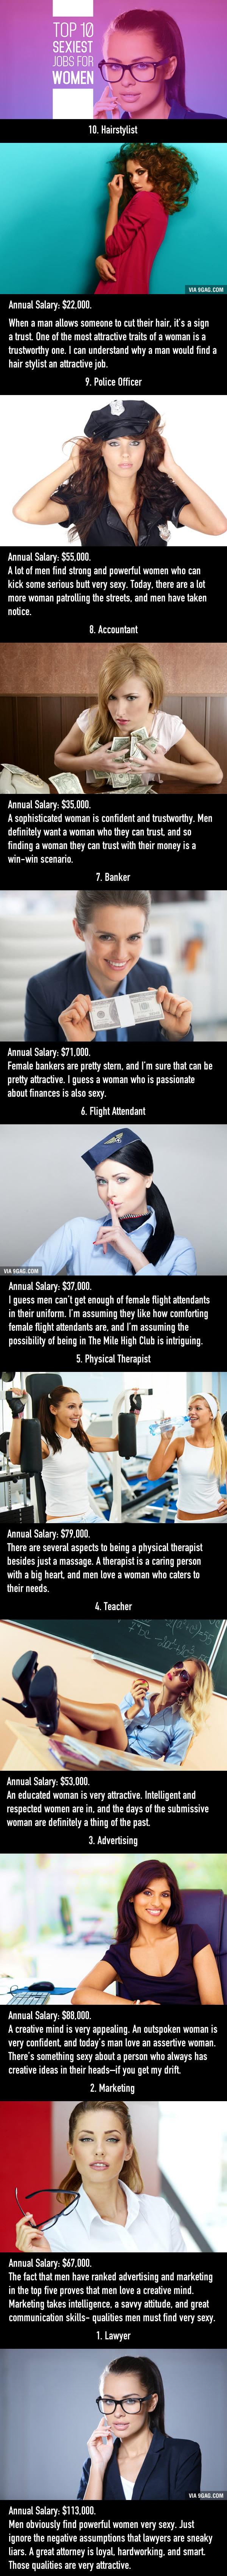 Sexiest jobs for women